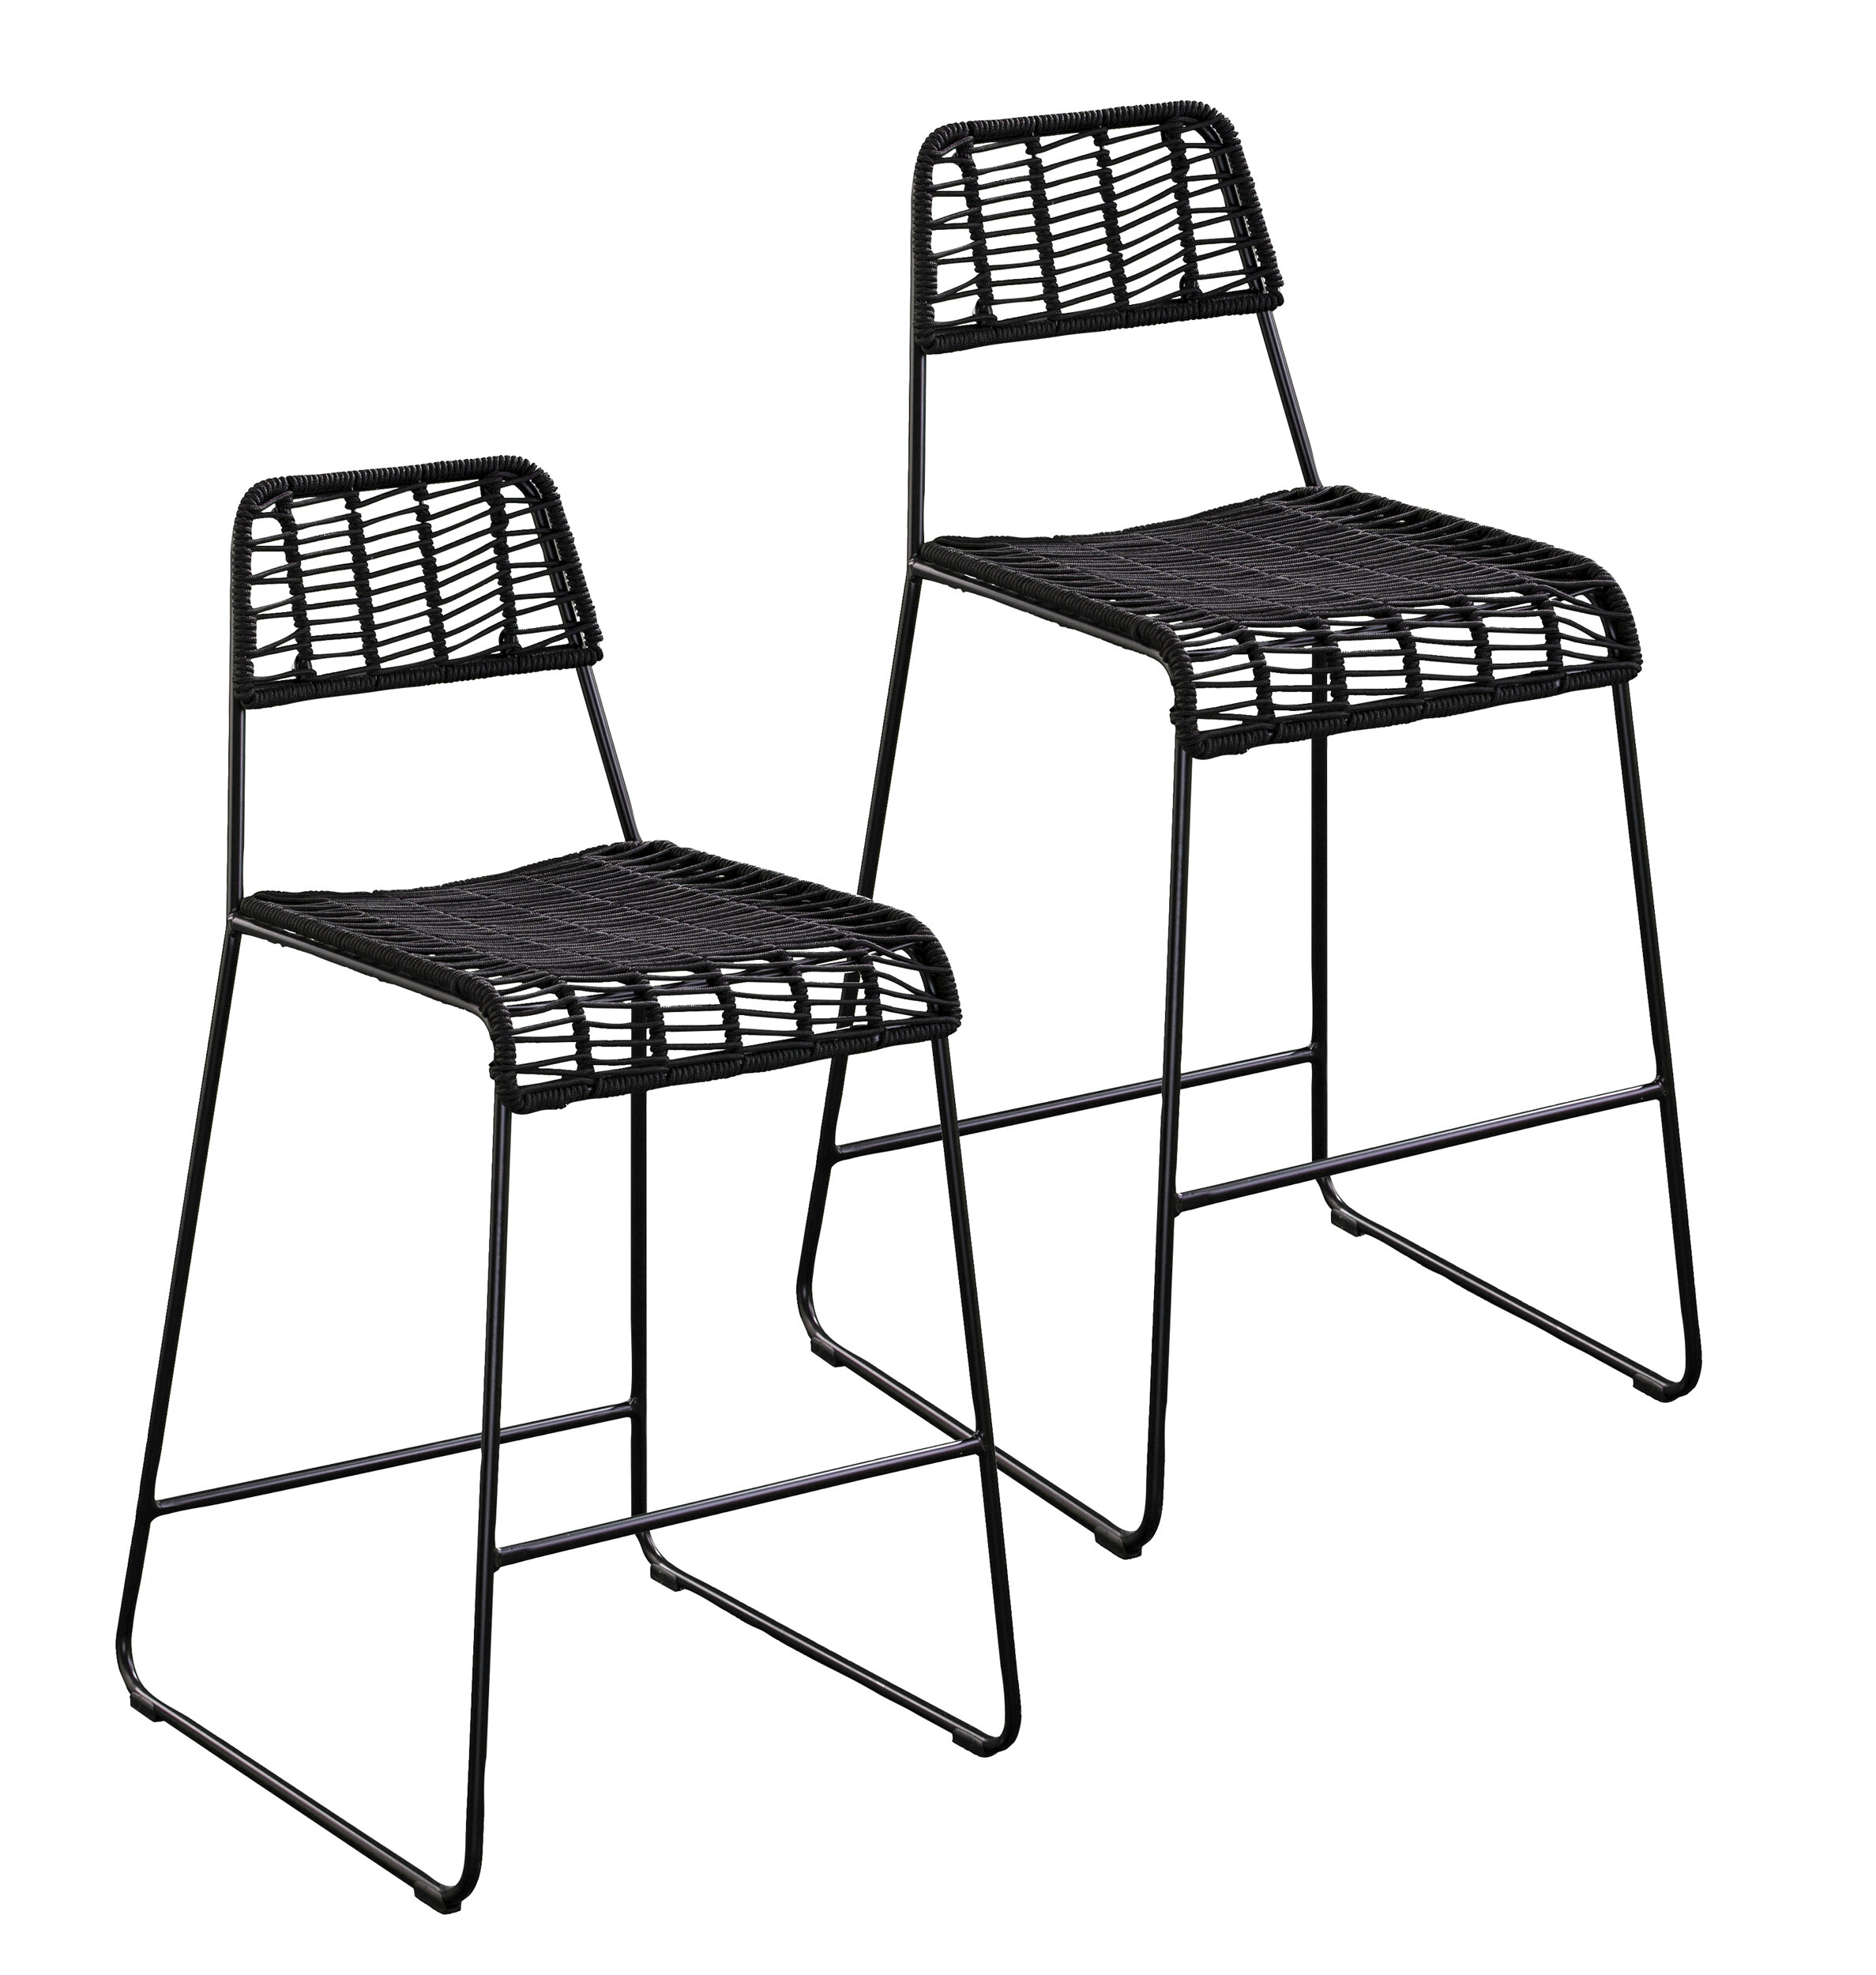 Superb Anzavia 26 Patio Bar Stool Andrewgaddart Wooden Chair Designs For Living Room Andrewgaddartcom